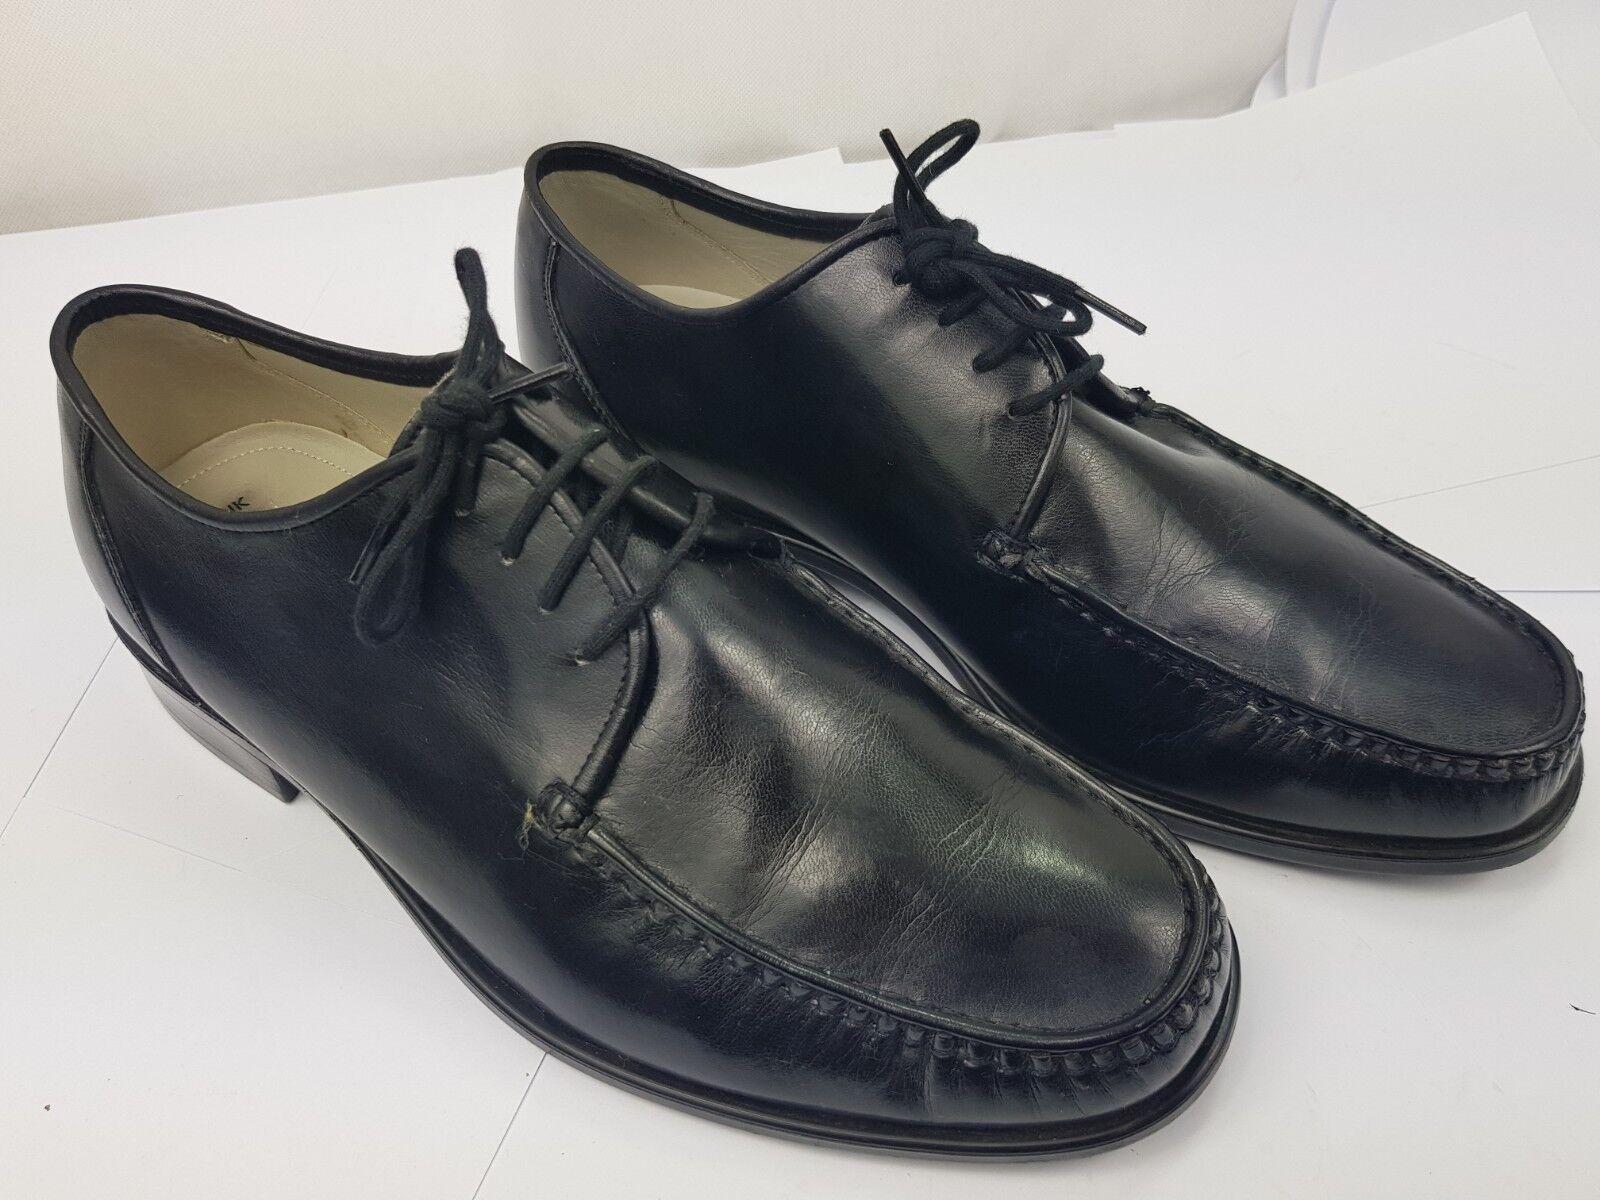 M&S Marks & Spencer Mens Non Polish Black Lace Up Leather shoes UK 8.5 EU 42.5